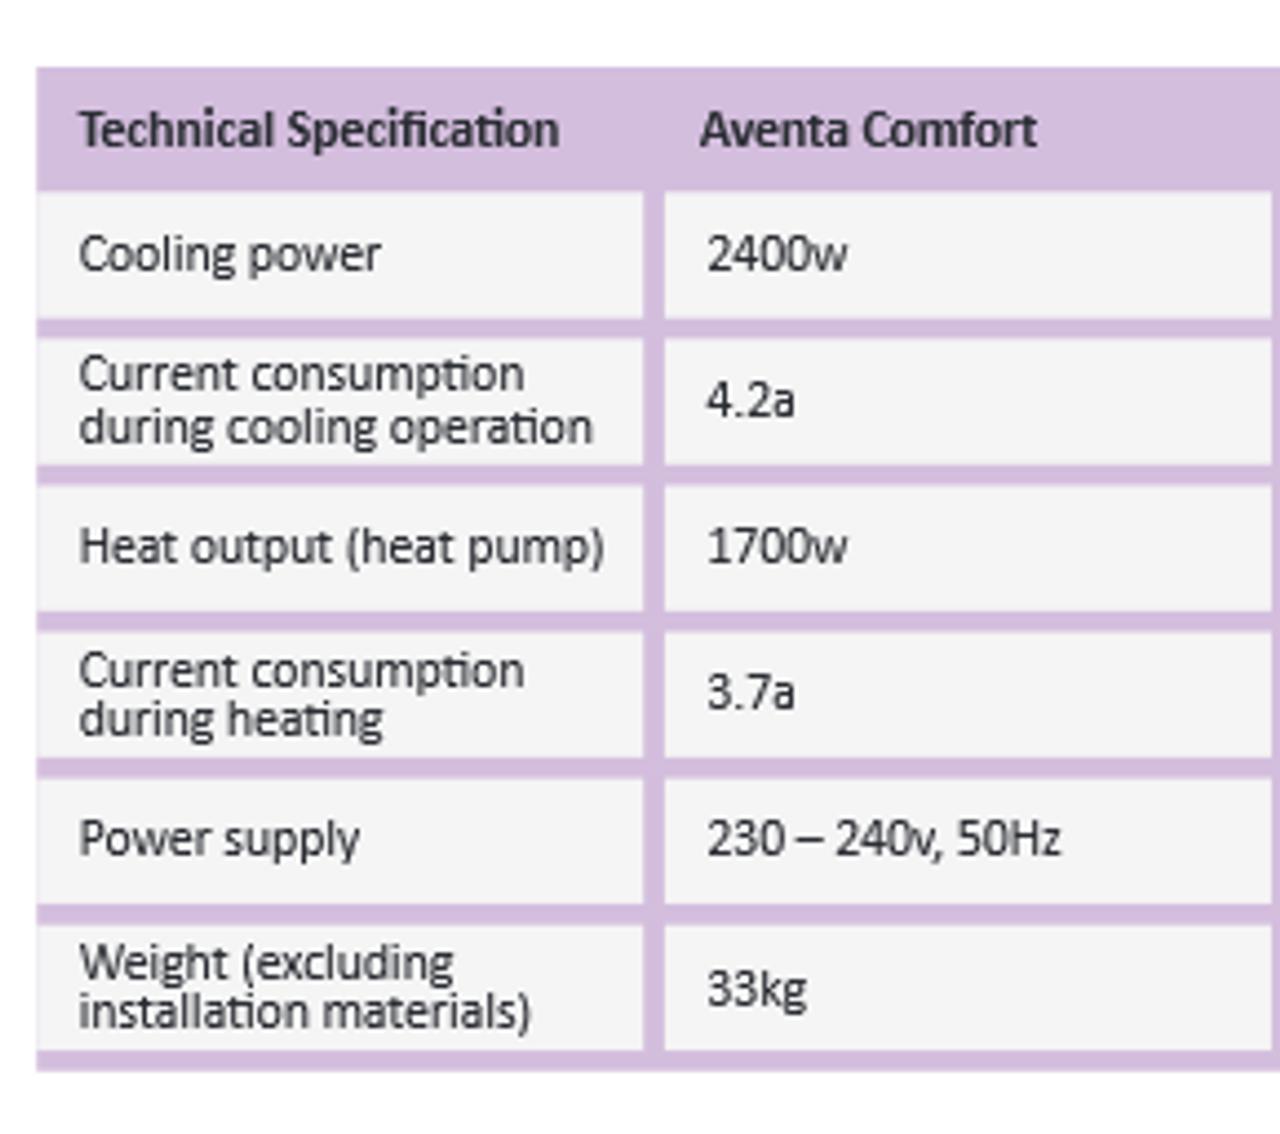 Truma Aventa air conditioning specifications